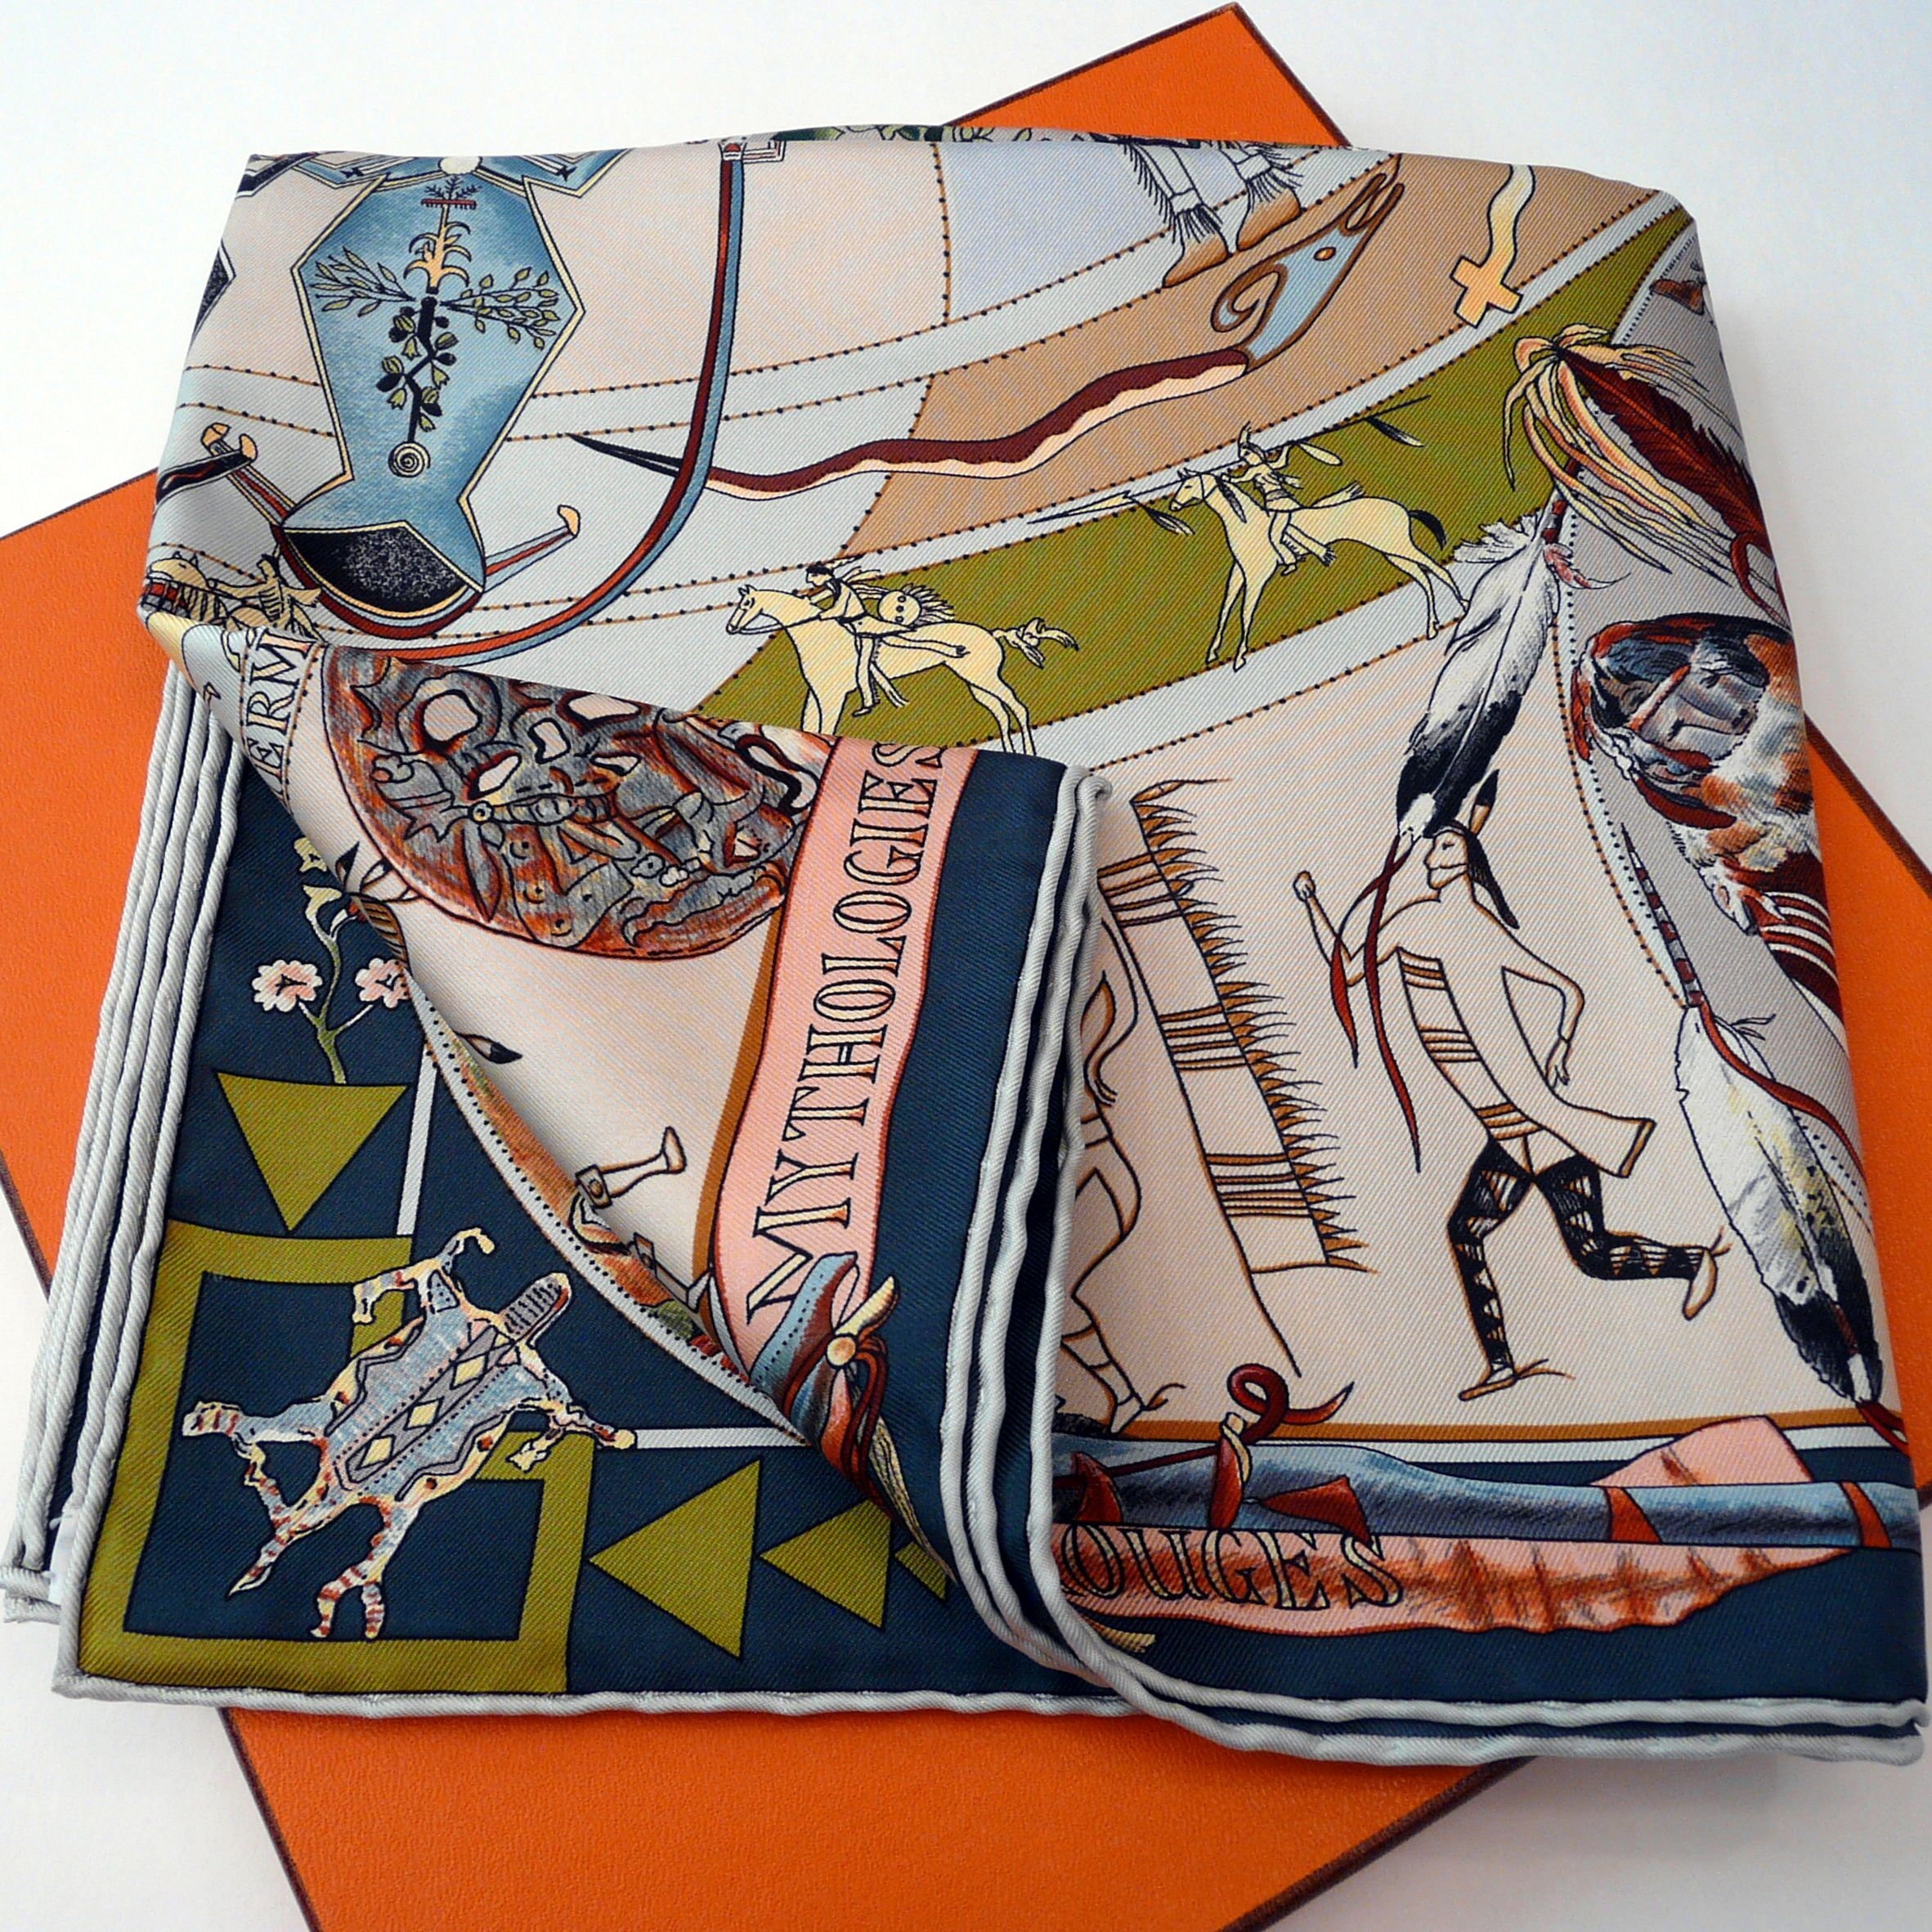 Mythologies des Hommes Rouges HERMES with scarf box